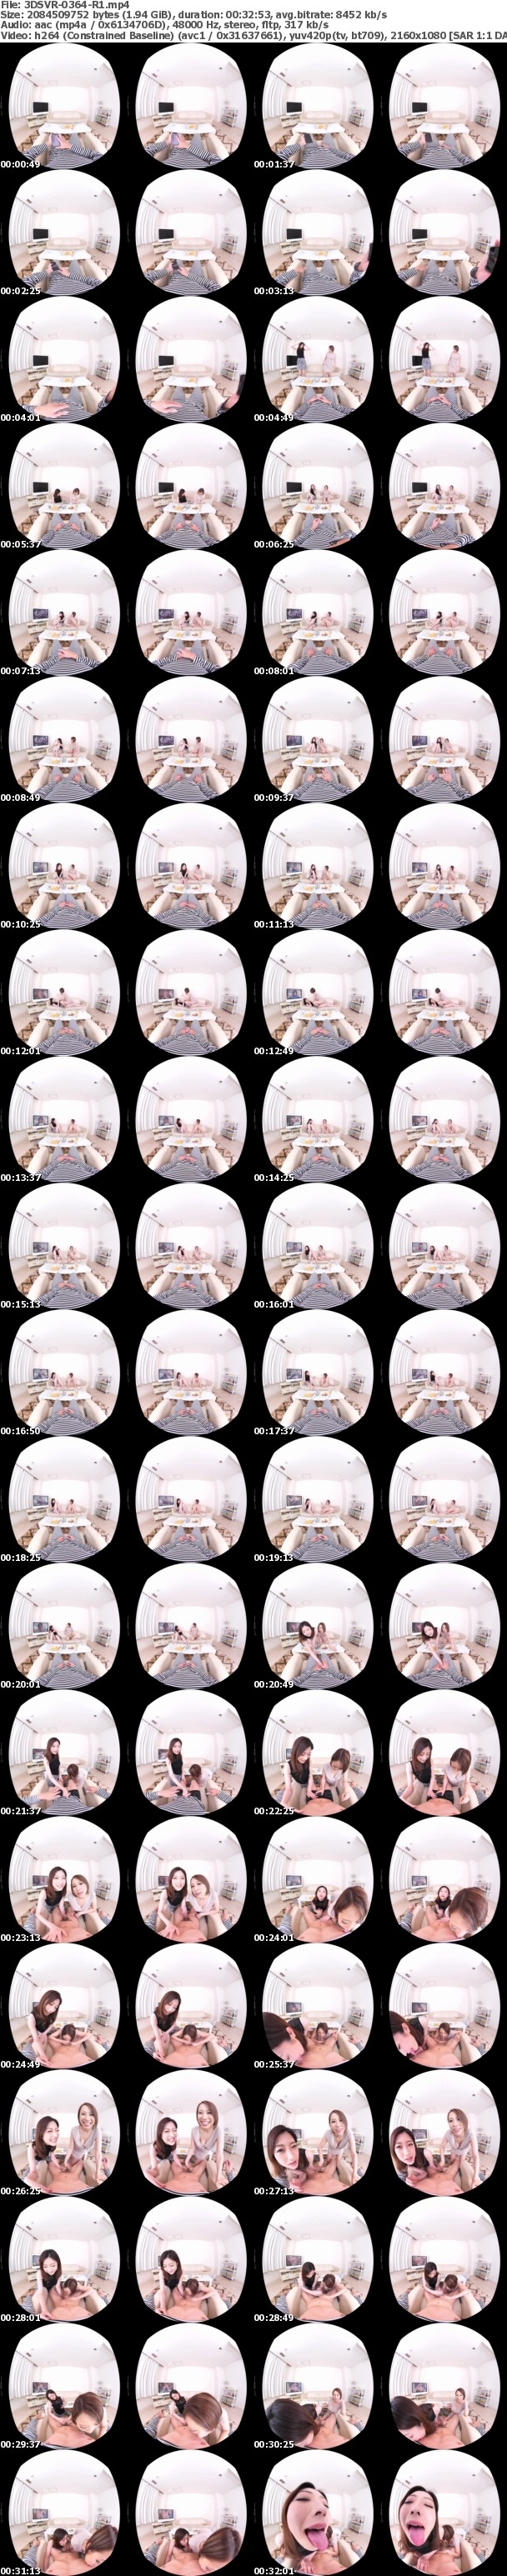 VR/3D 3DSVR-0364 【超高画質版】終電を逃した酔っ払いの女友達がボクの家で女子会の二次会!普段は全く男扱いしないくせに泥酔した彼女たちはボクのデカチンに目をつけて性欲のままハメまくる3P天国!